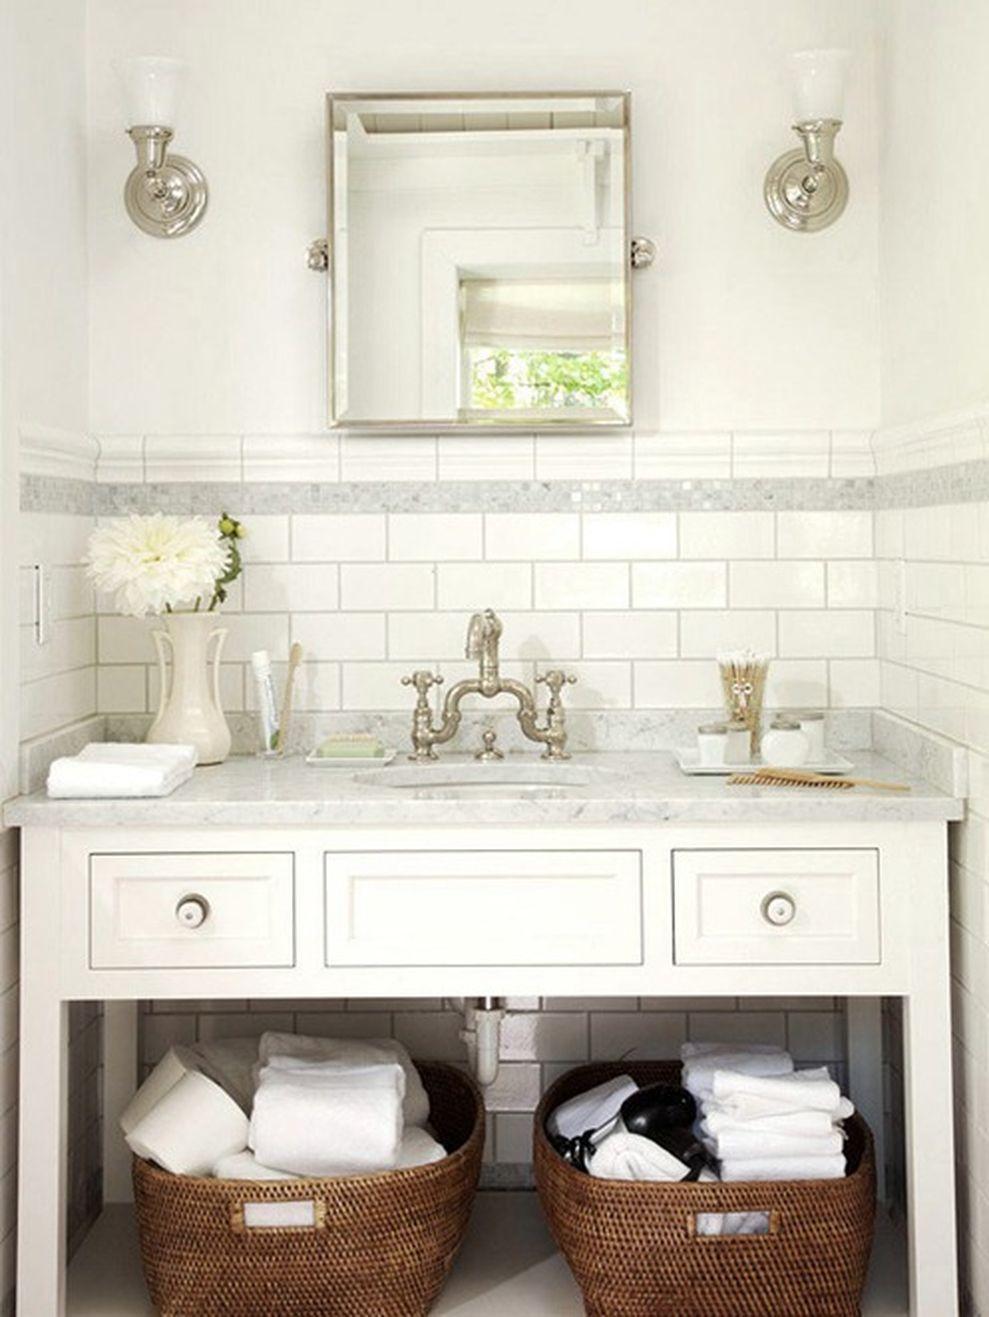 24 Timeless Bathroom Renovation With Subway Tile Backsplash | Subway ...